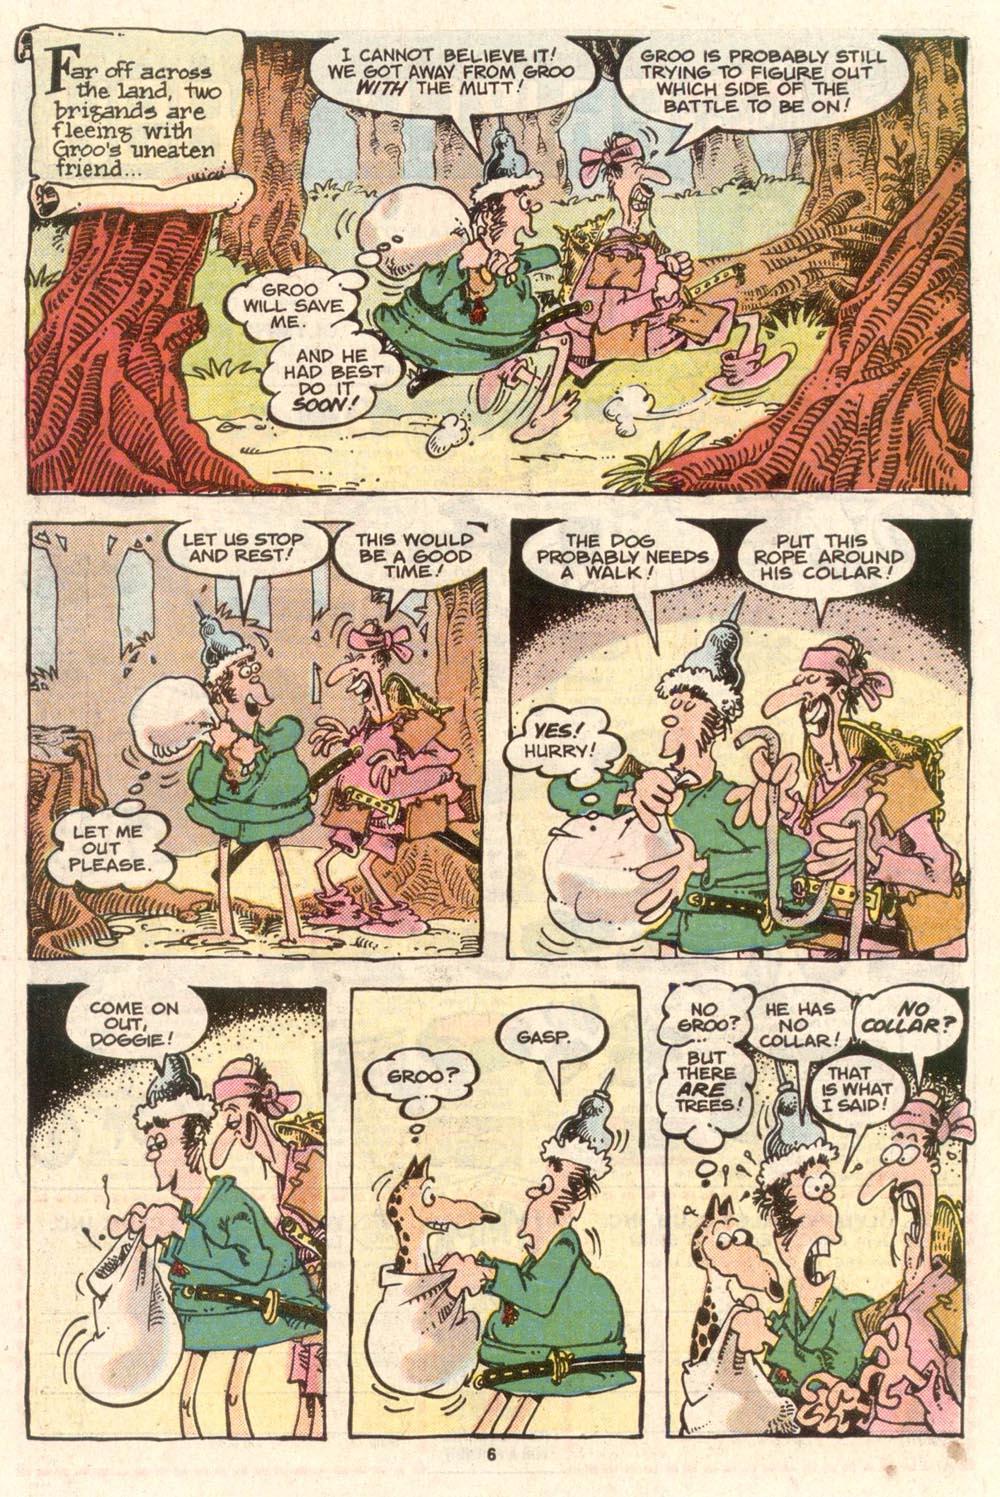 Read online Sergio Aragonés Groo the Wanderer comic -  Issue #39 - 6